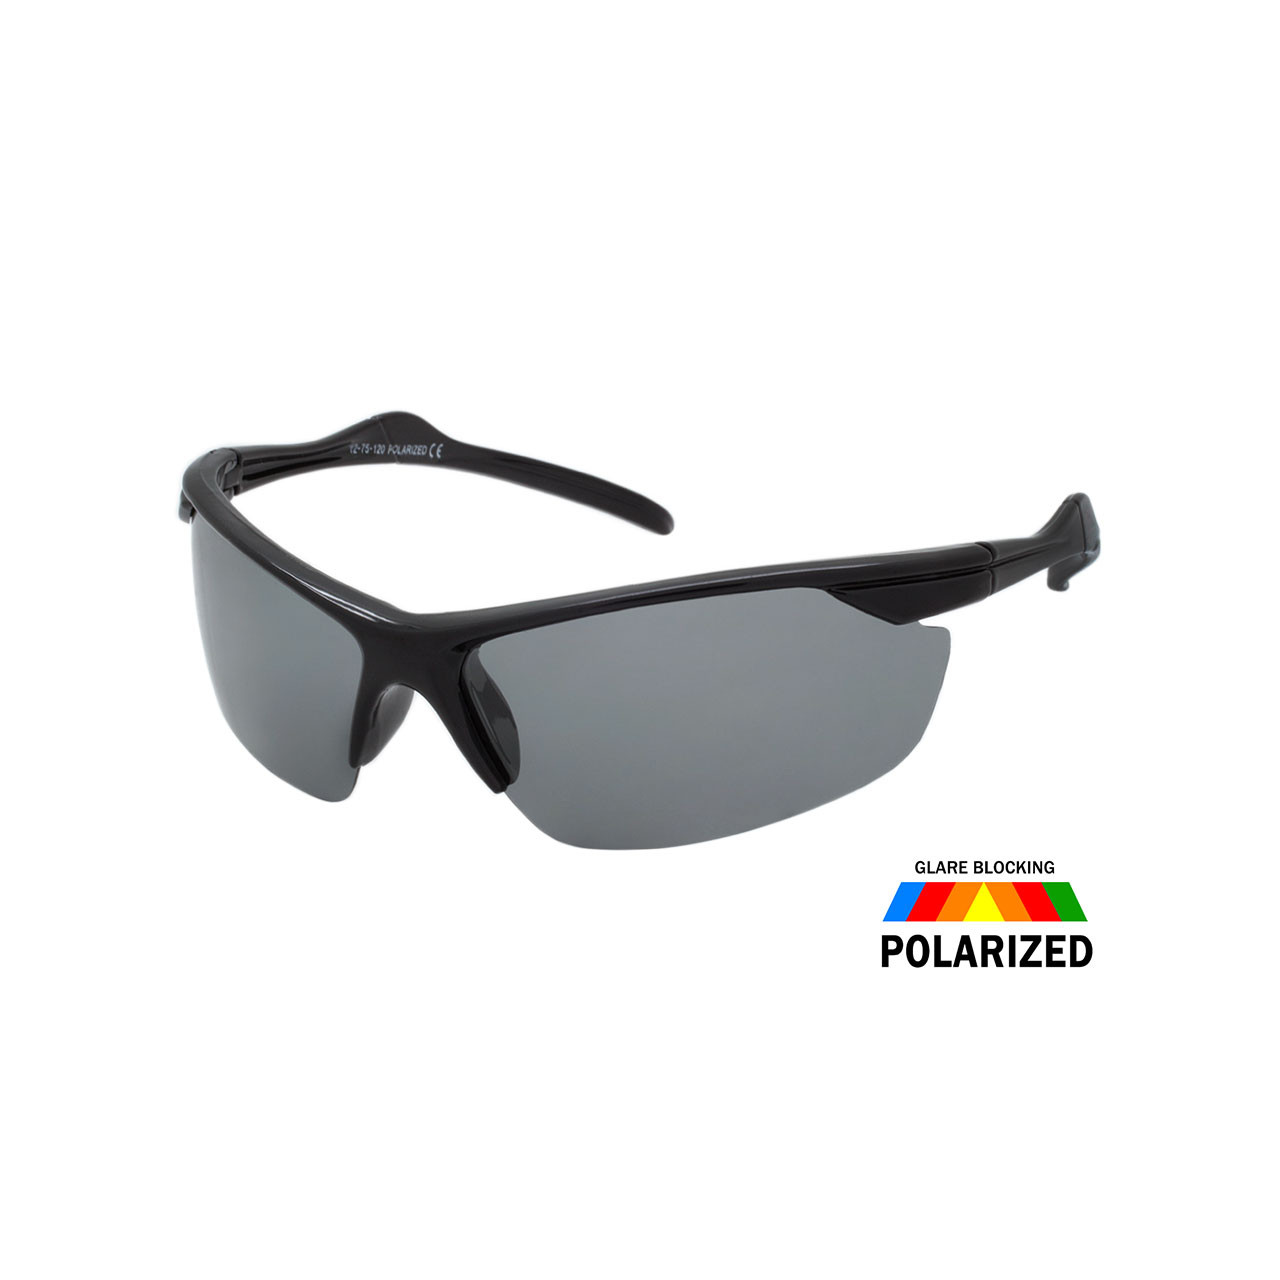 5132dffdbadd Wholesale Assorted Colors Polycarbonate Polarized Semi-Rimless Sport ...